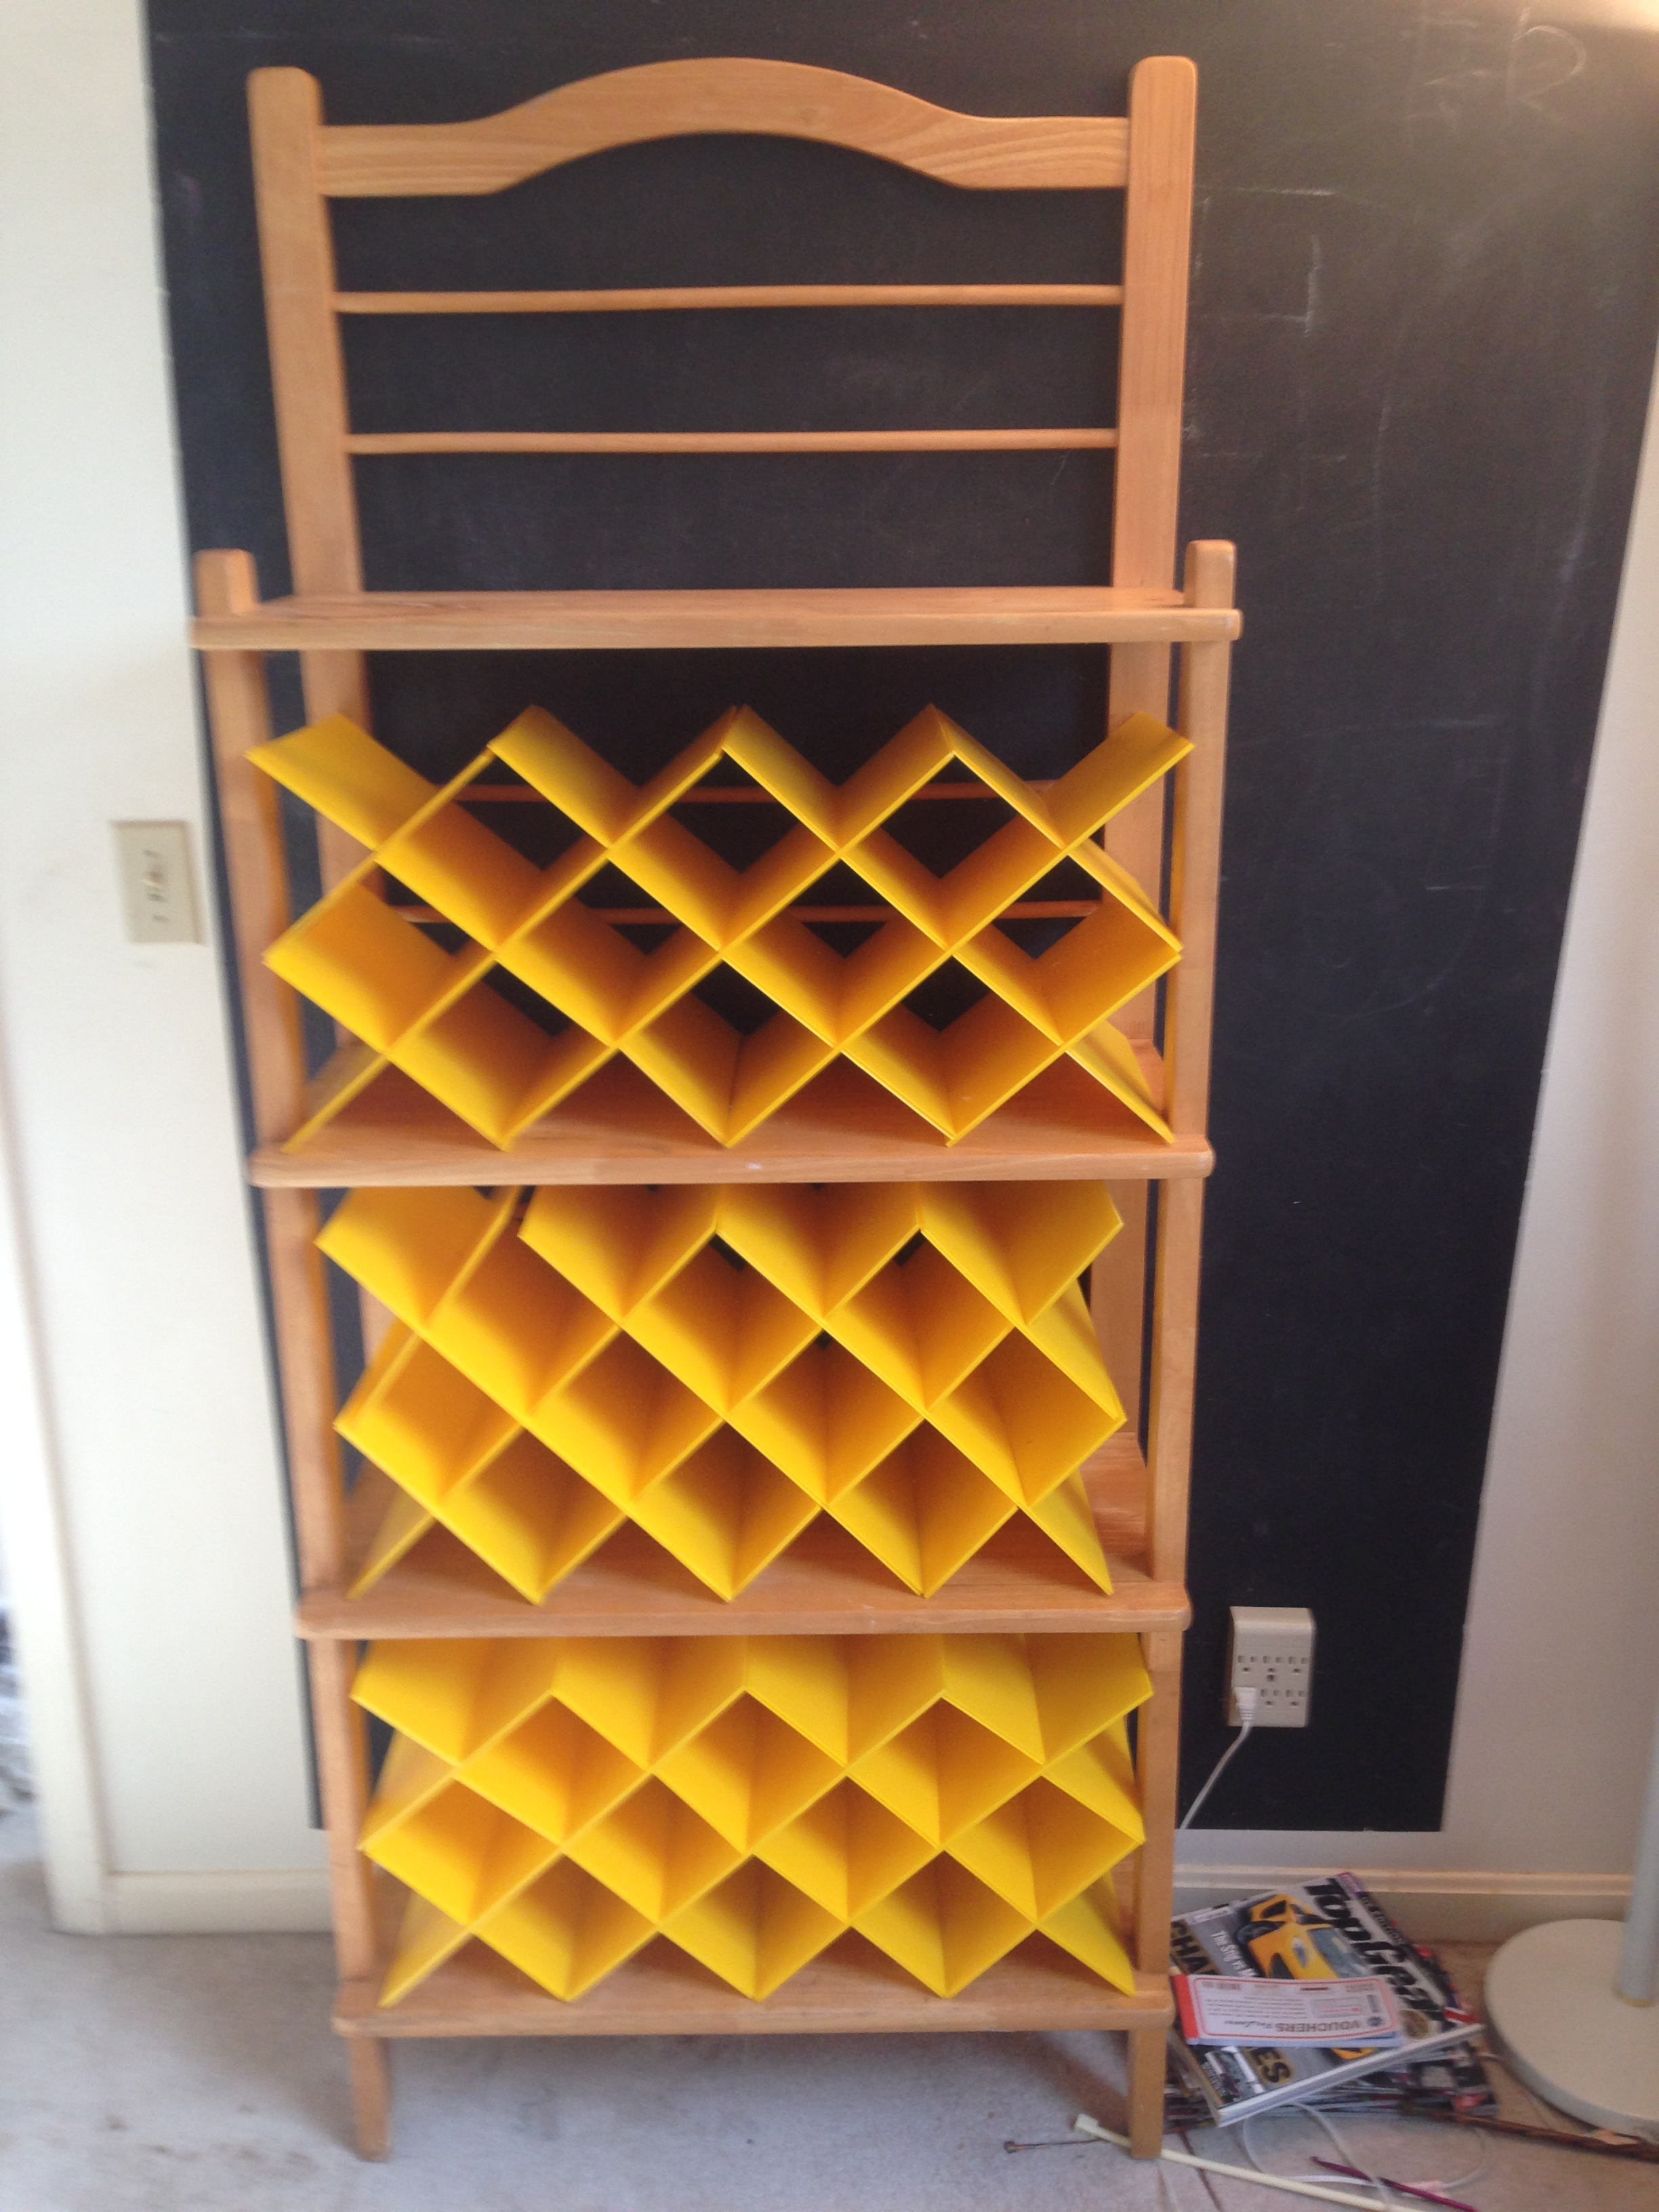 Claypool Knitting Shelves